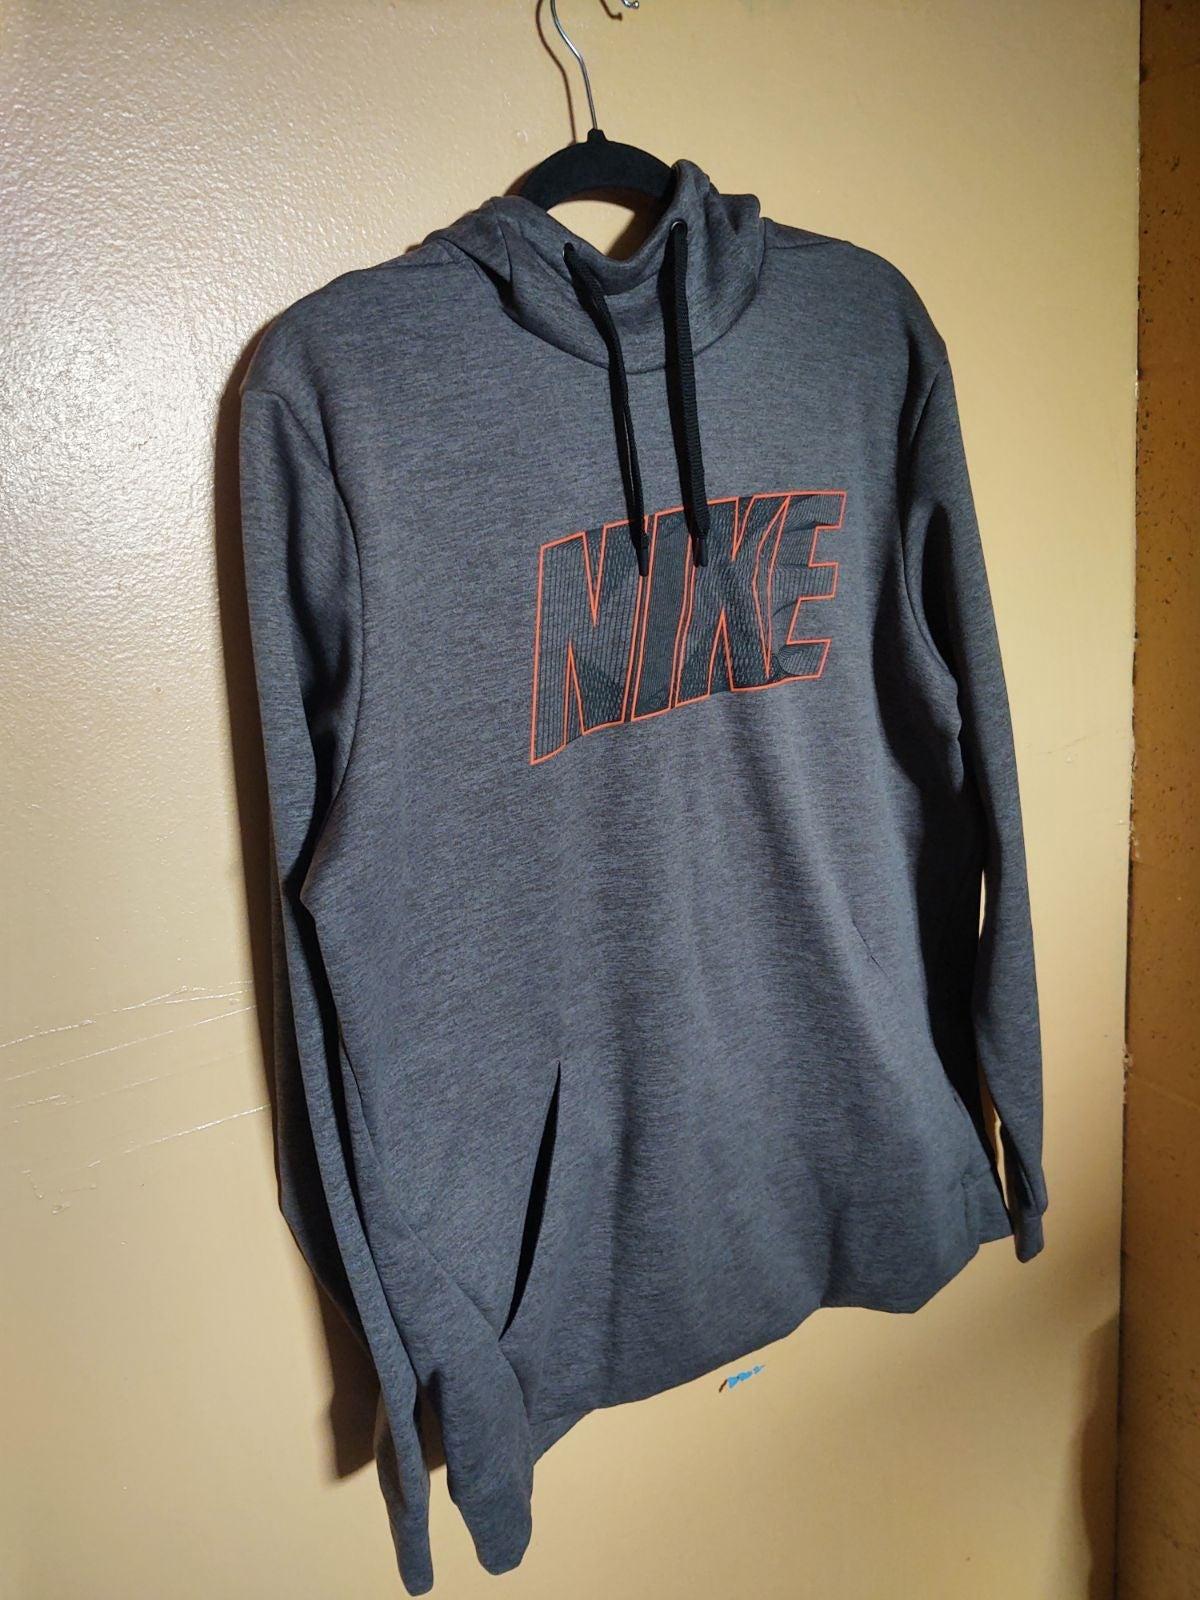 Nike grey orange sweater